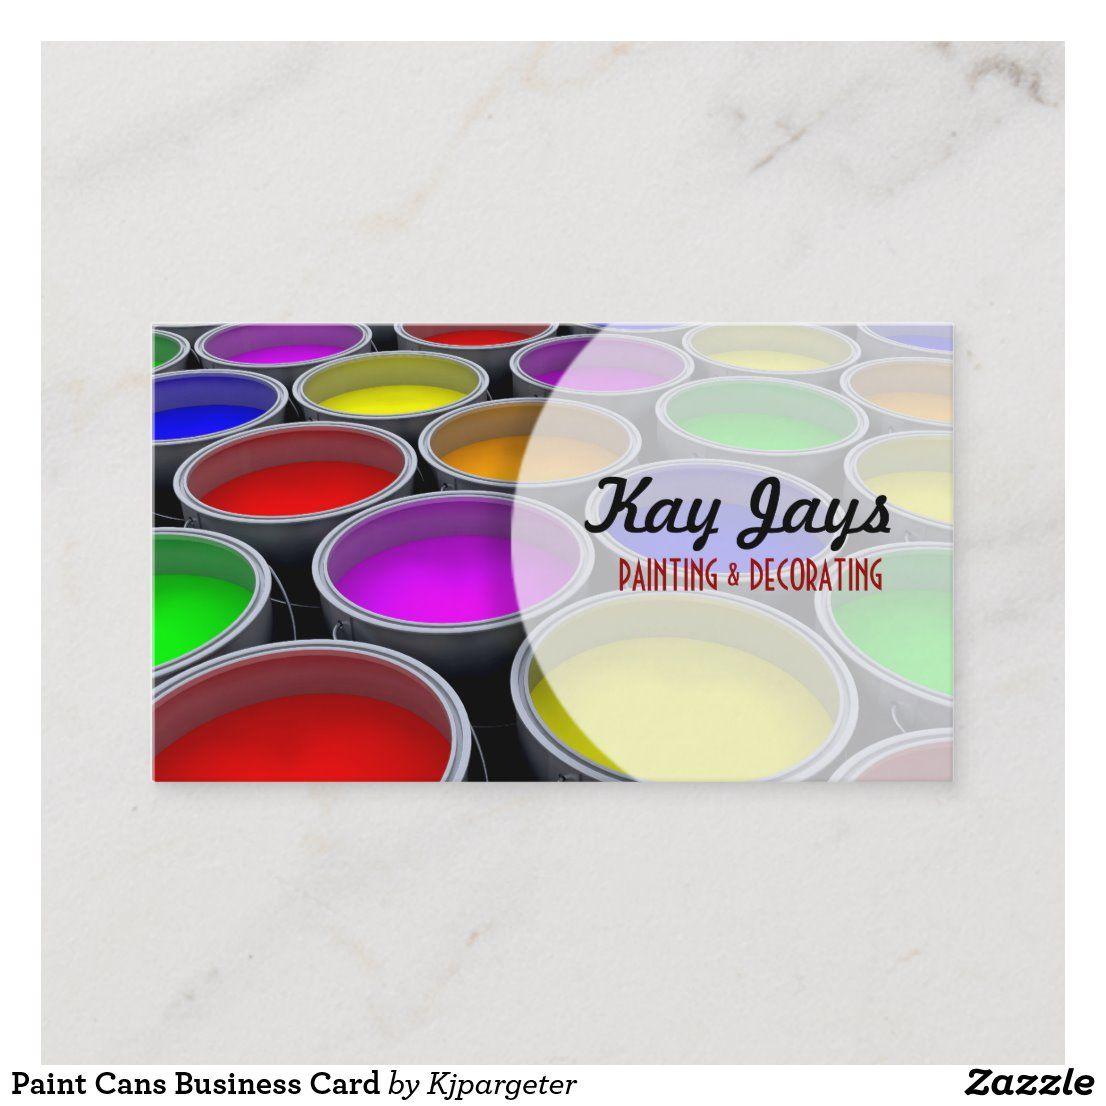 Paint Cans Business Card Zazzle Com In 2021 Painter Business Card Decorator Business Card Paint Cans